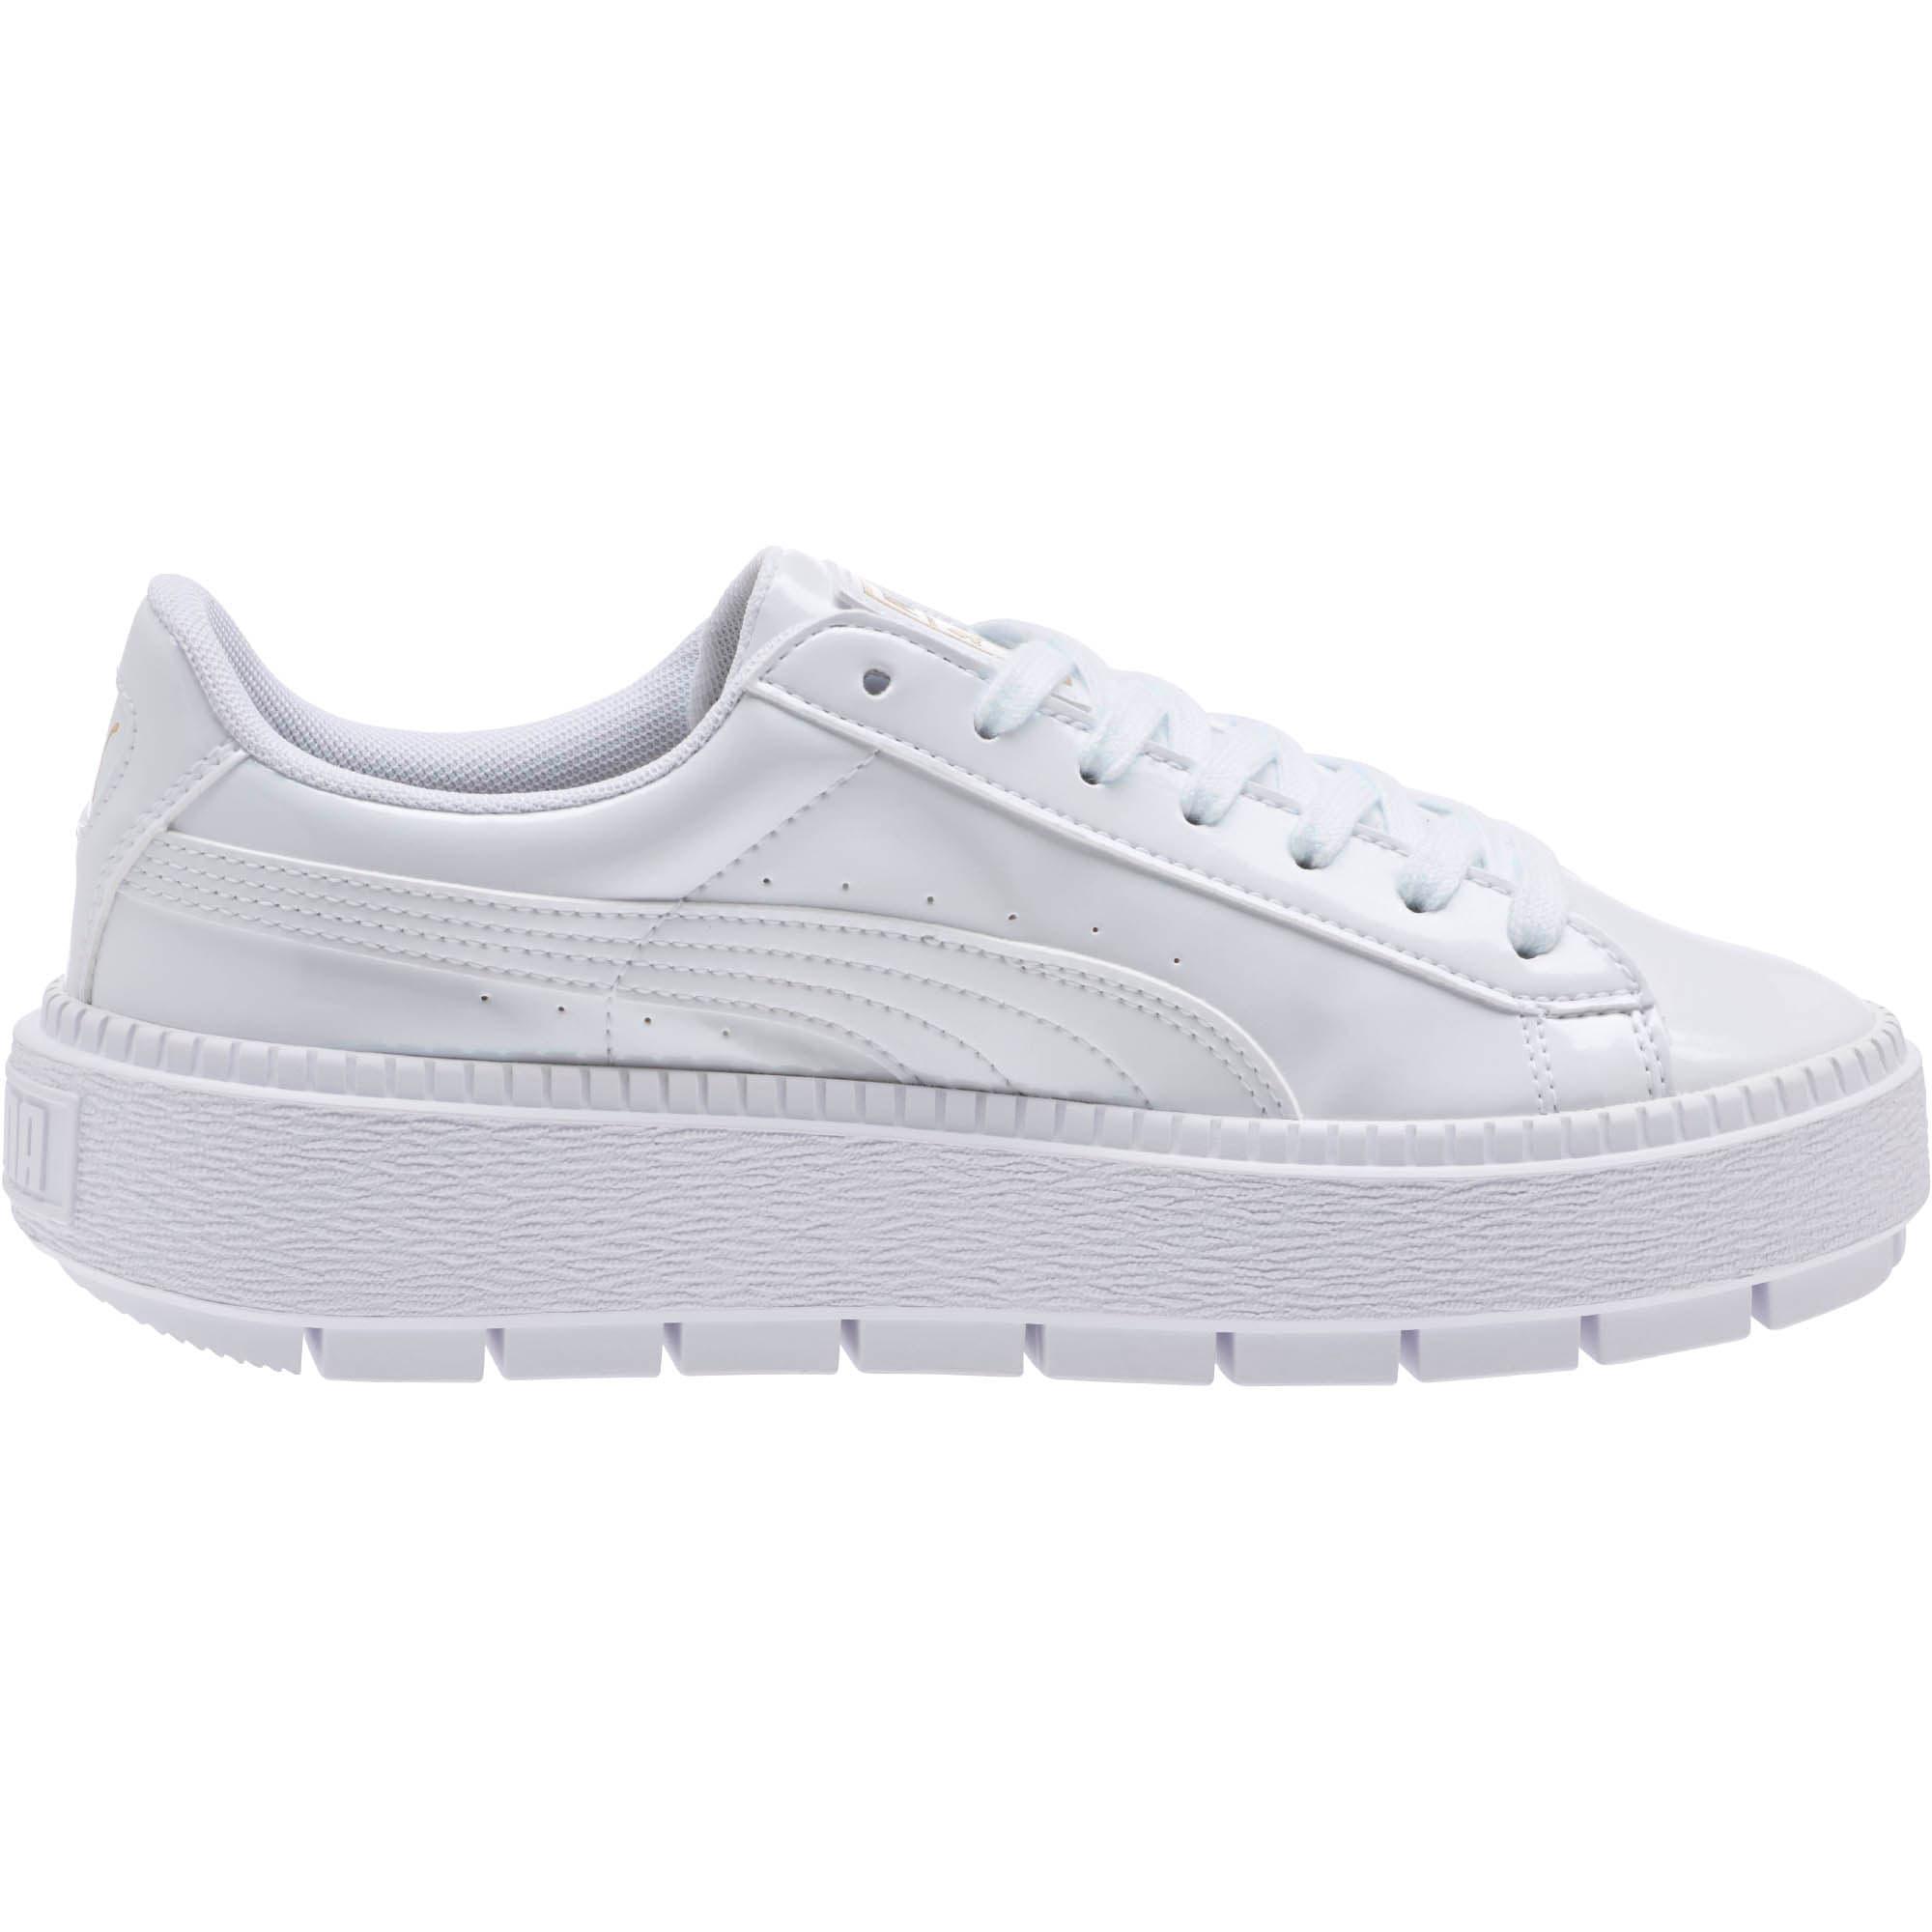 half off 178c1 961ae Basket Platform Trace P Women's Sneakers